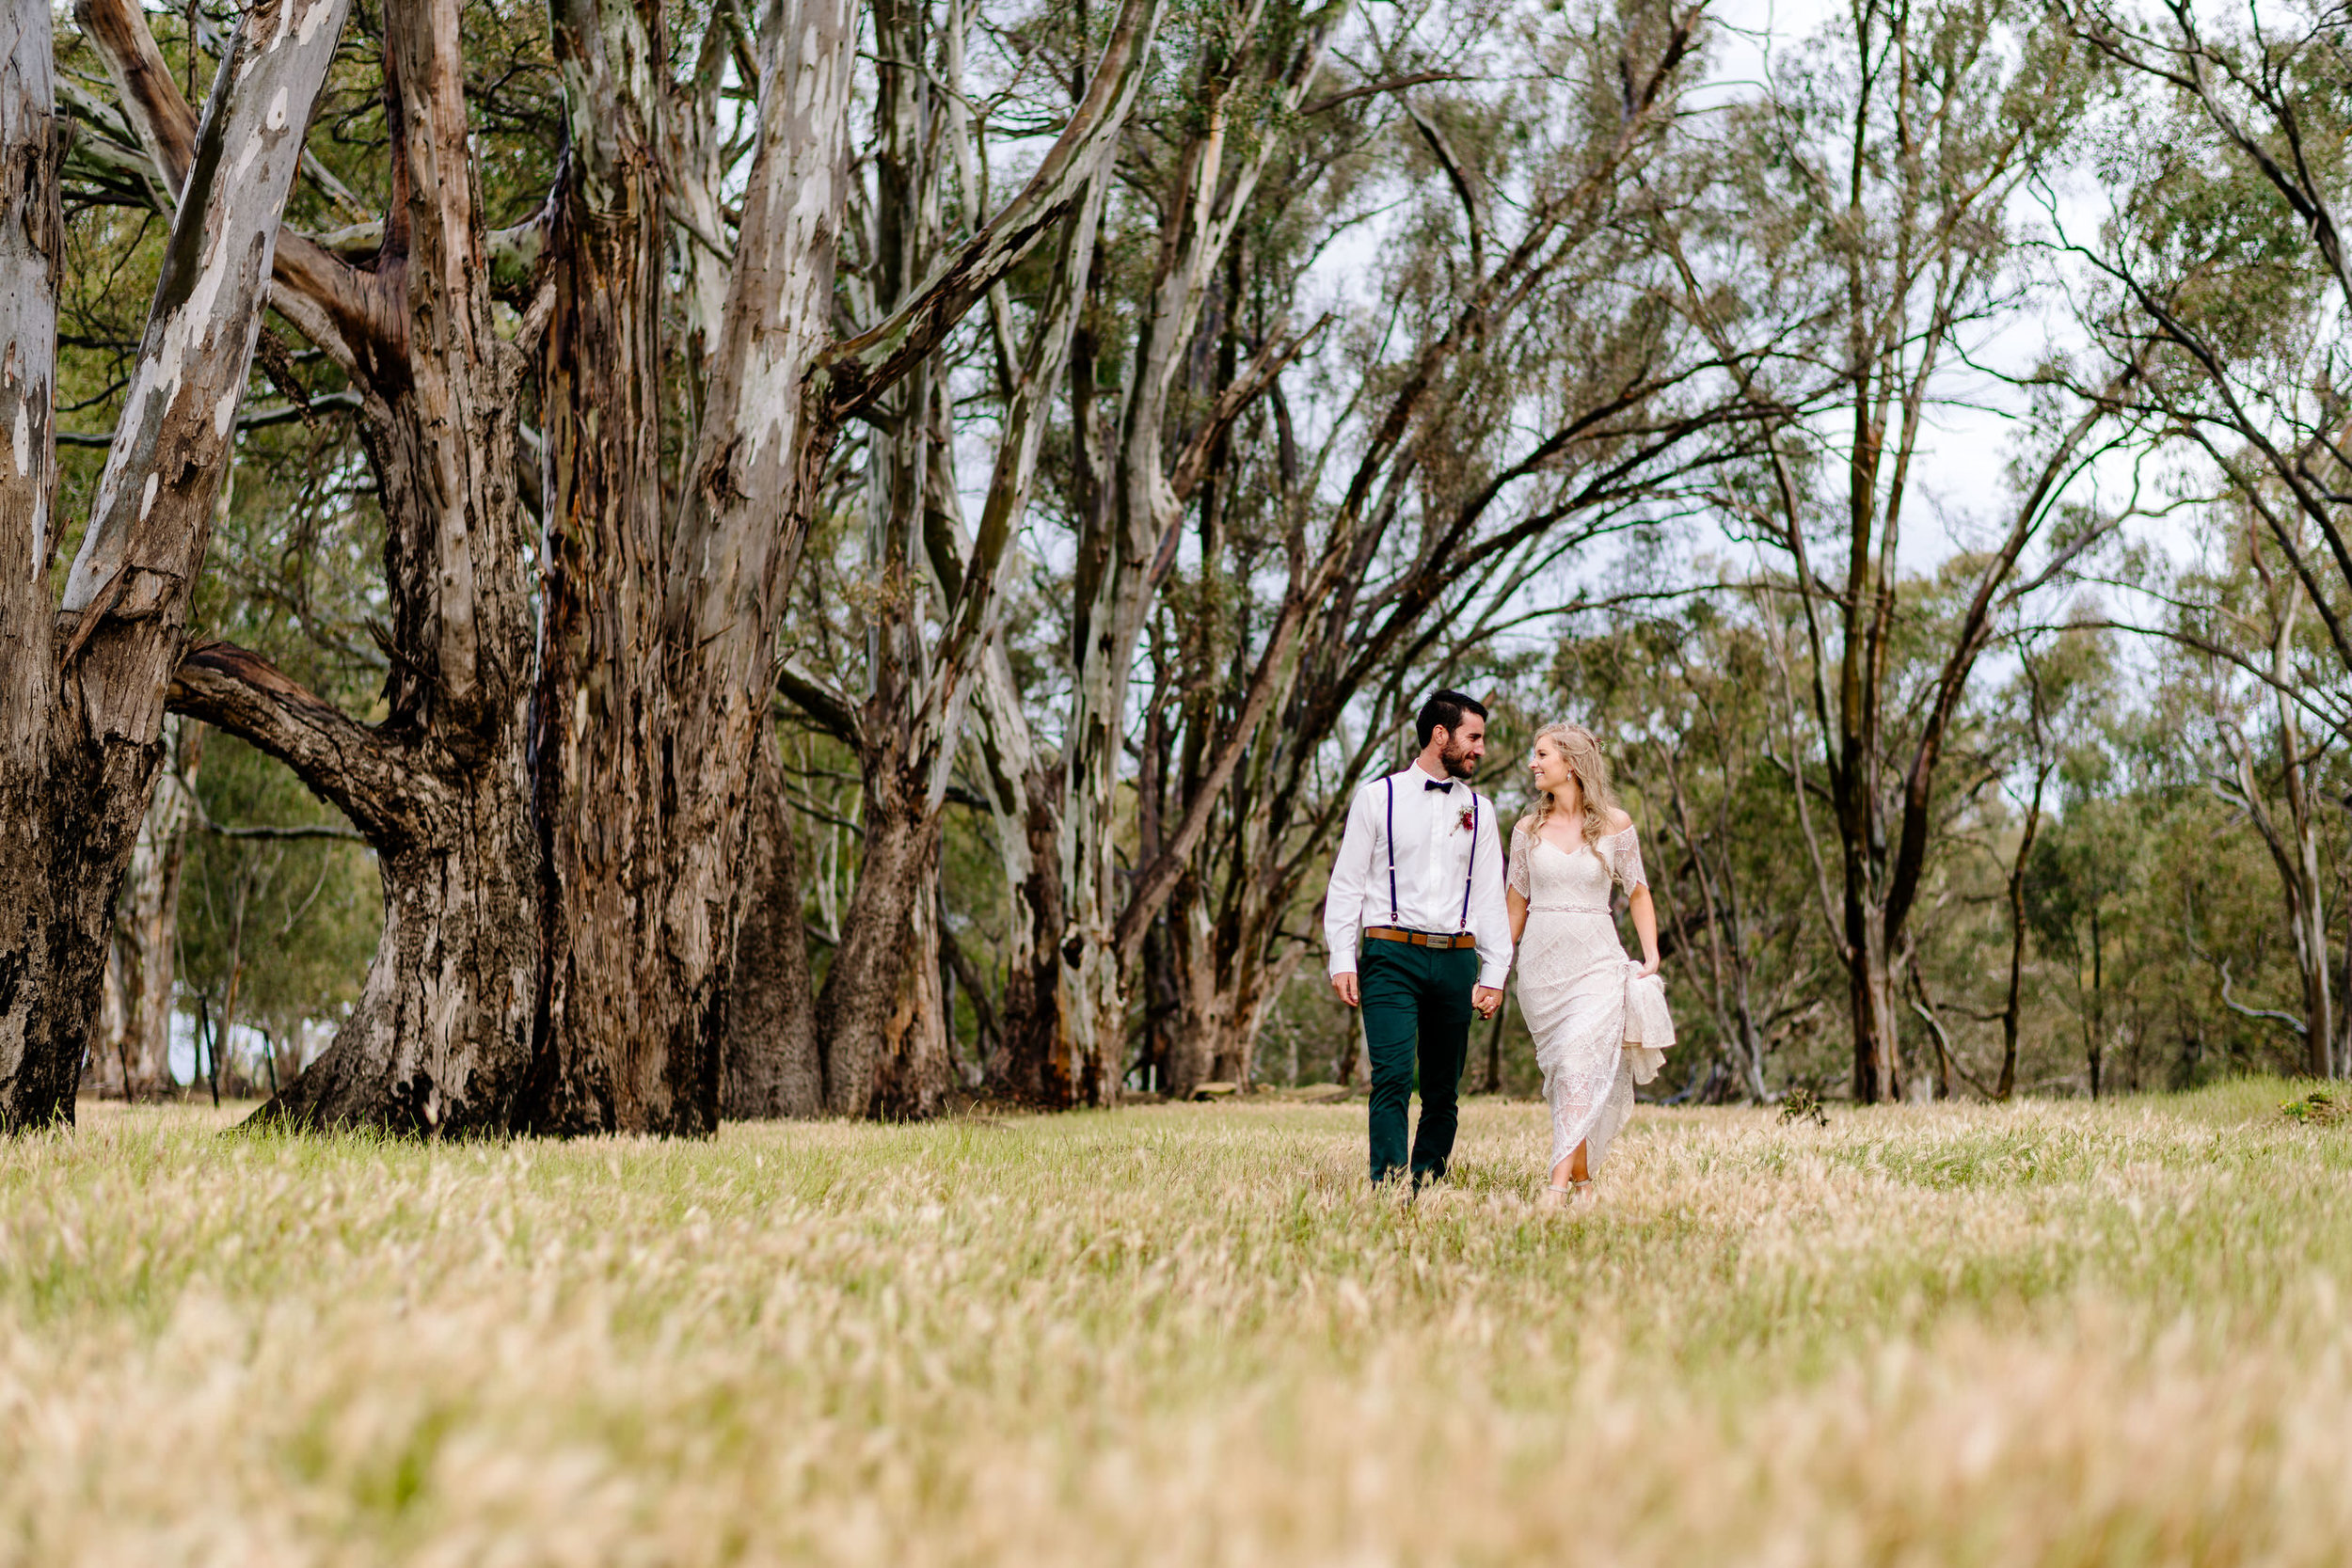 Justin_And_Jim_Photography_Backyard_Wedding204.JPG